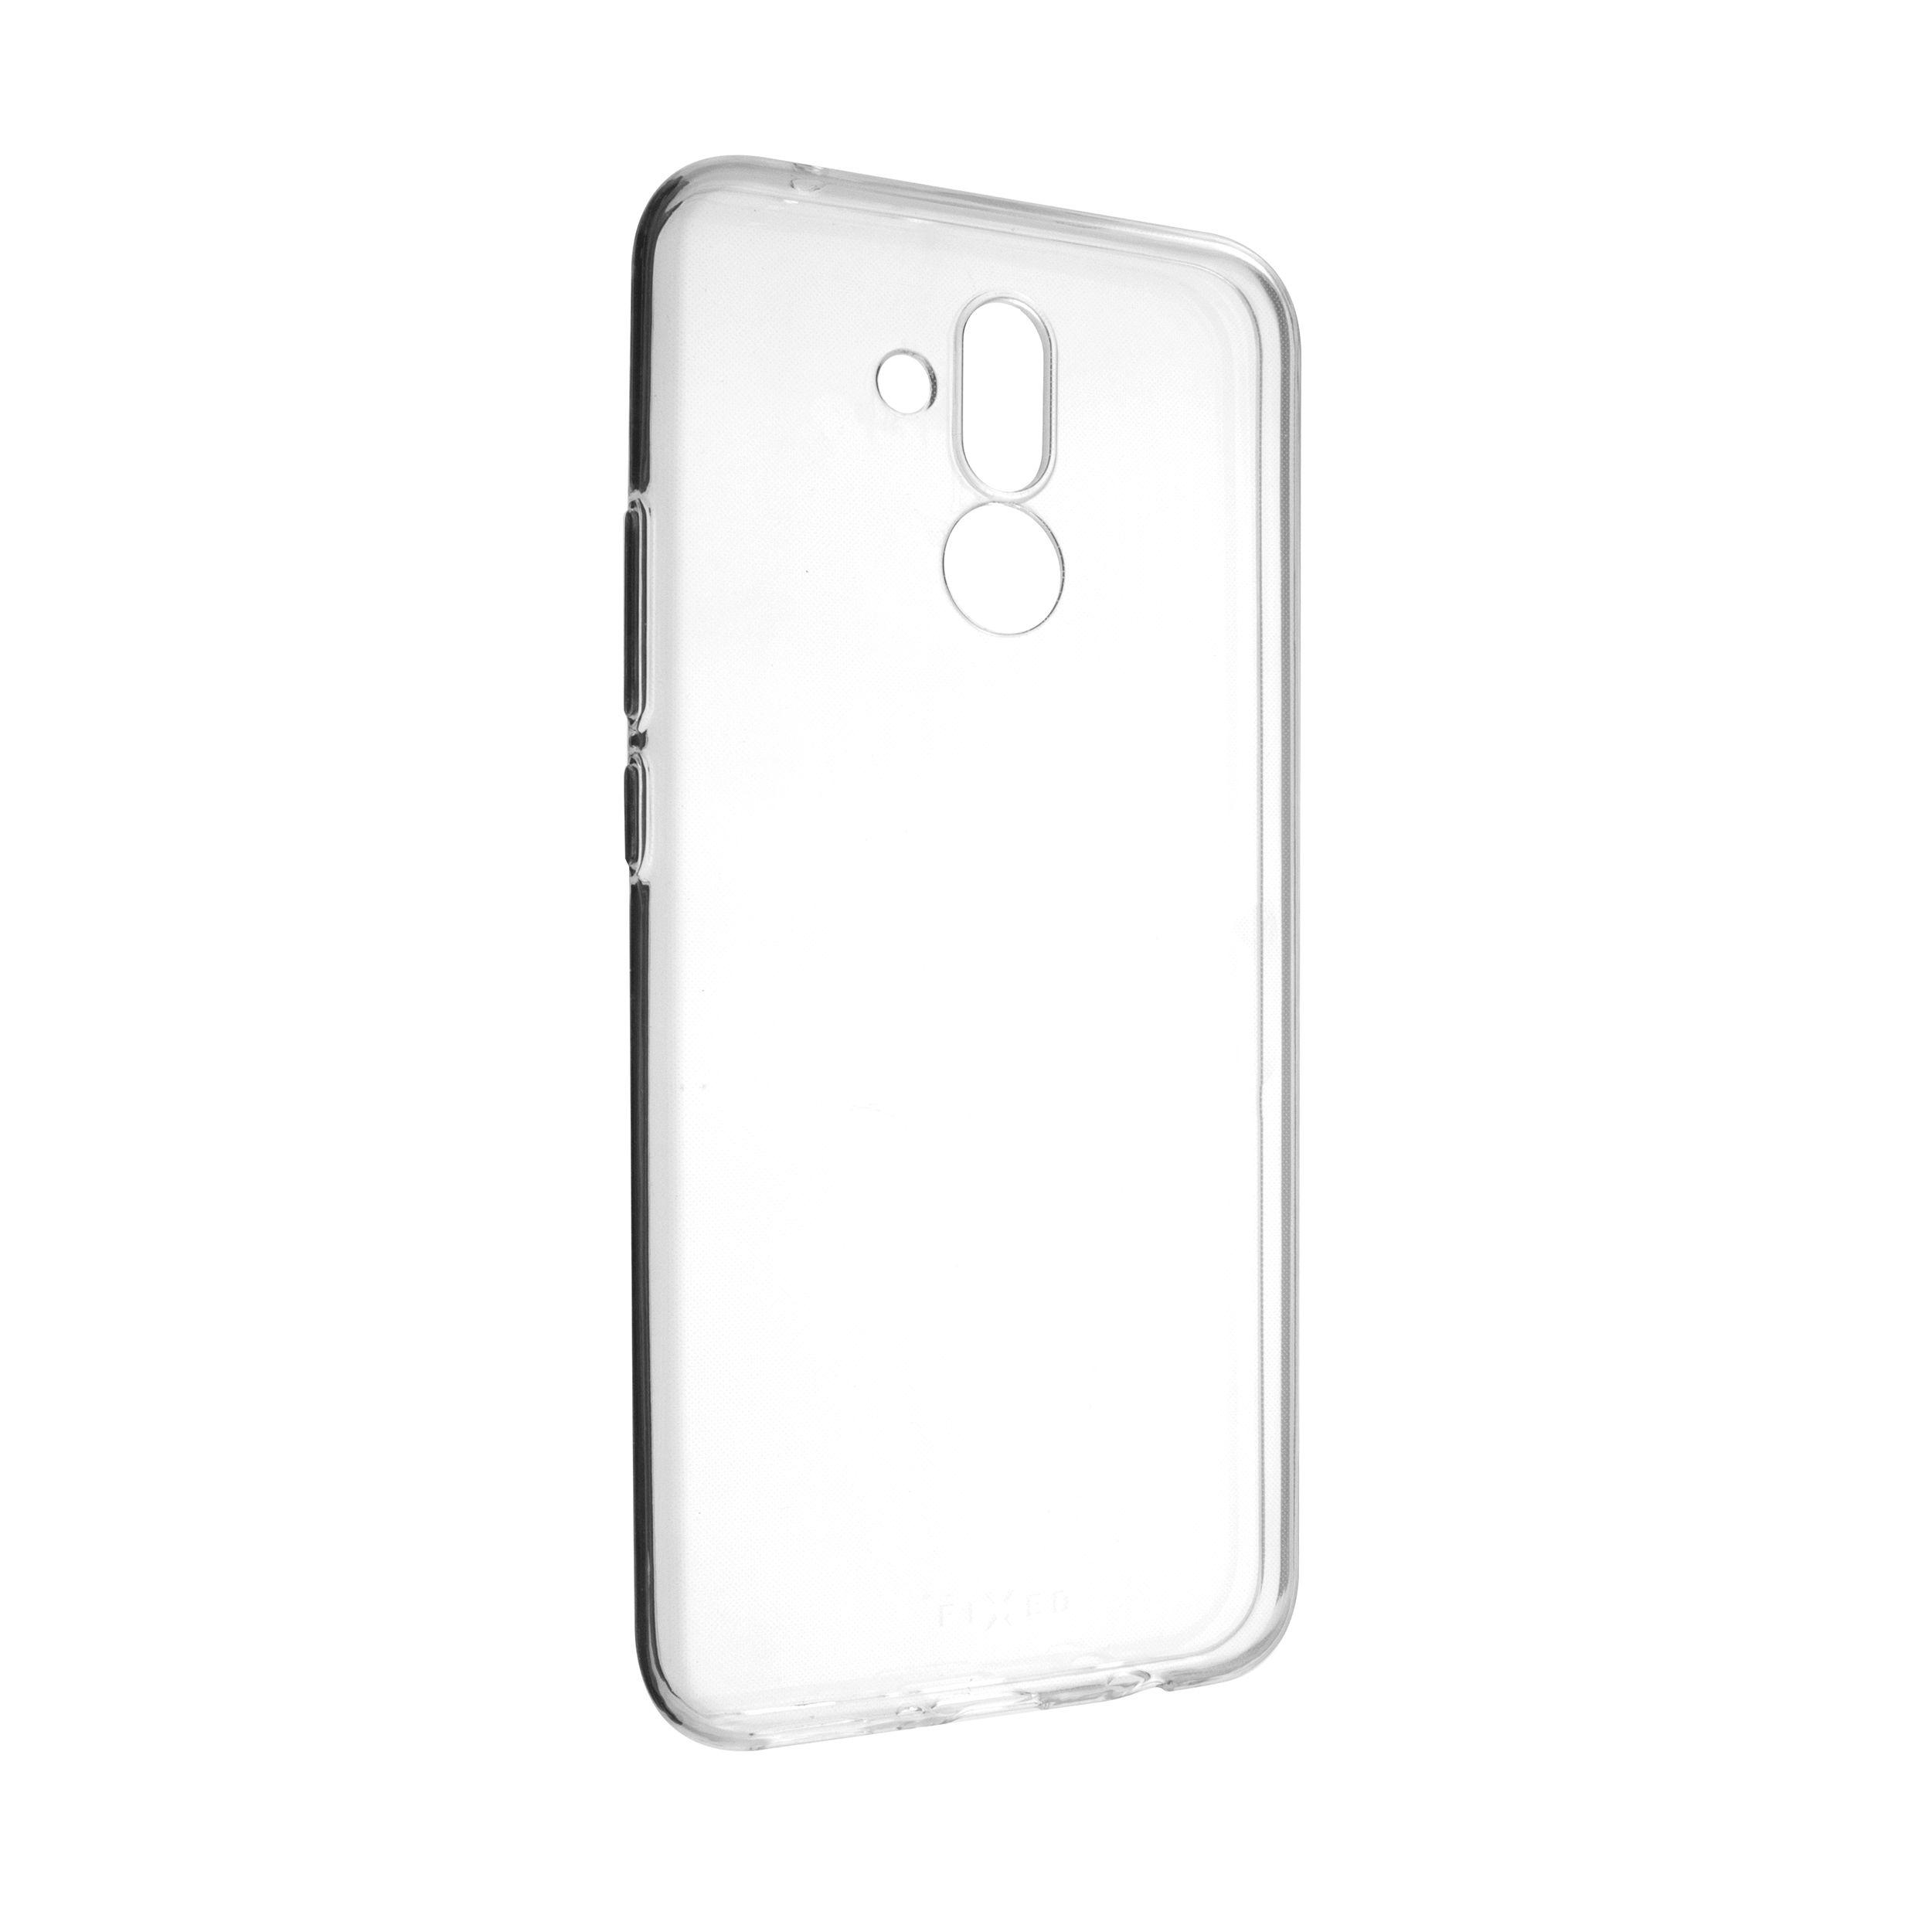 TPU gelové pouzdro FIXED pro Huawei Mate 20 Lite, čiré